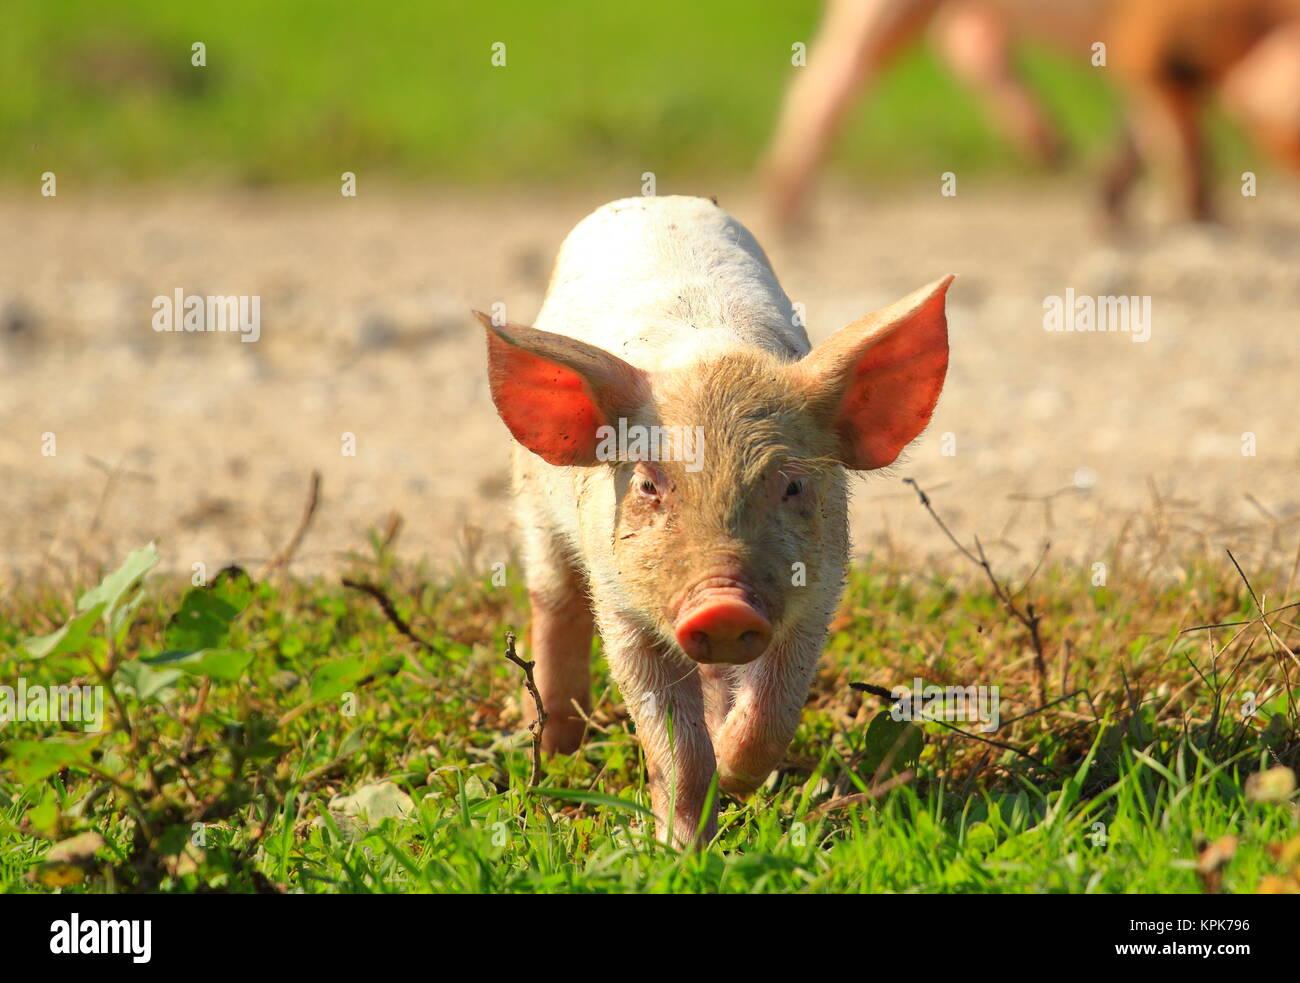 Cute piglet - Stock Image